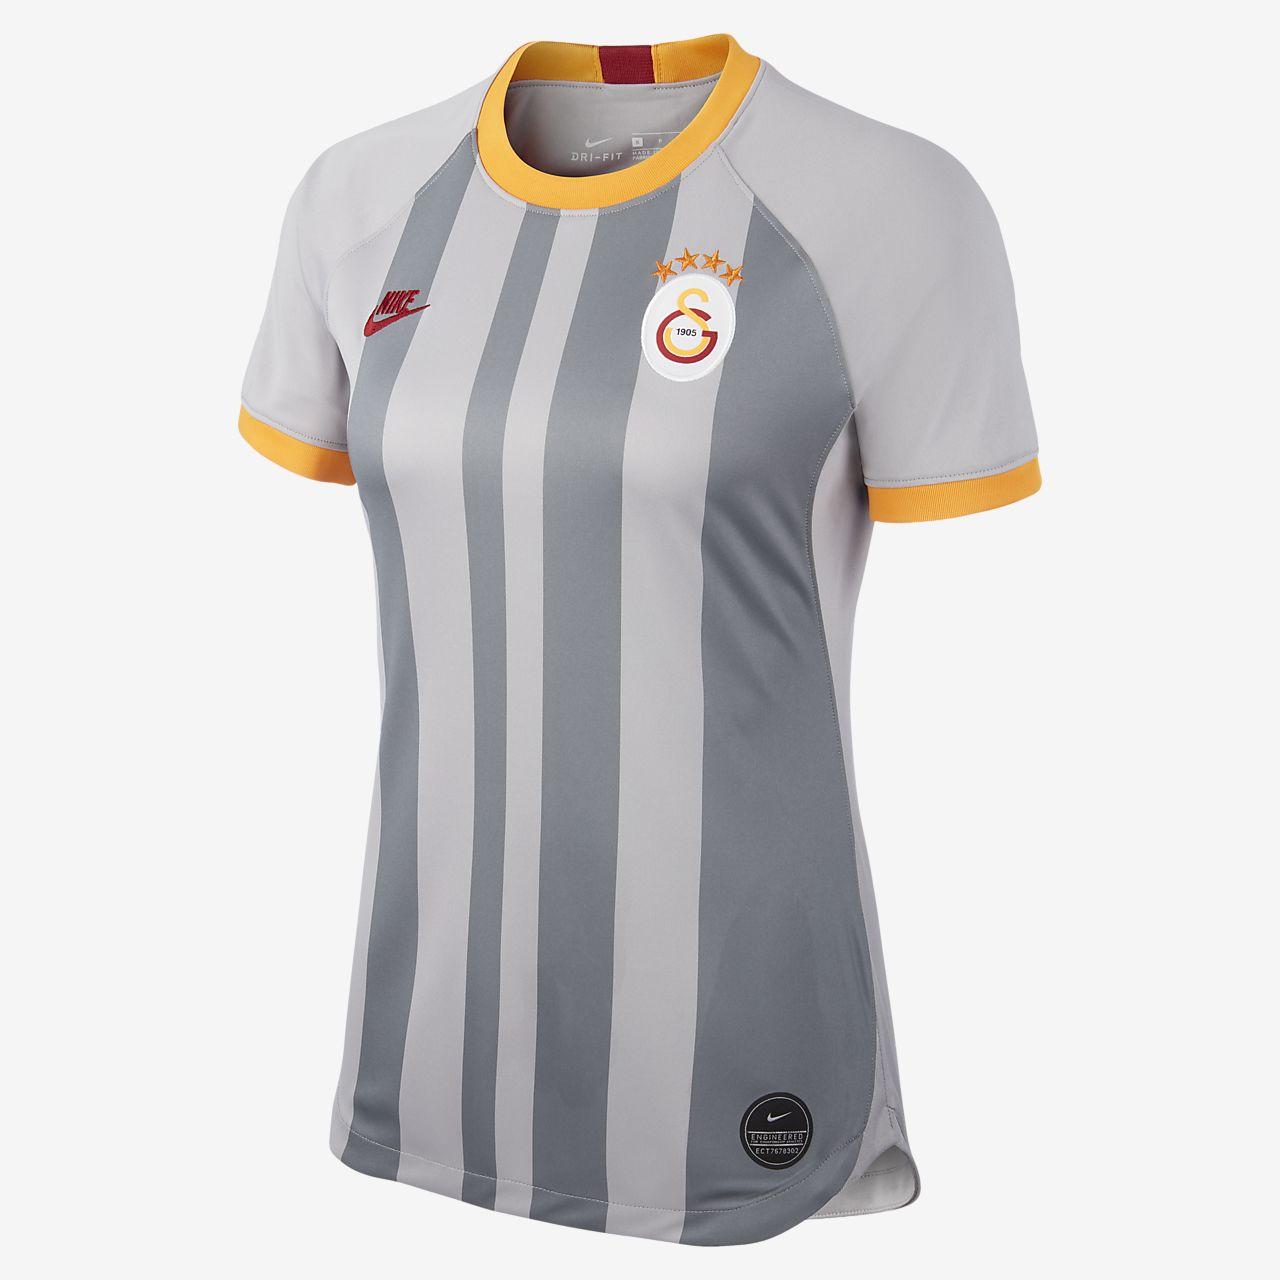 Camiseta de fútbol alternativa para mujer Stadium del Galatasaray 2019/20